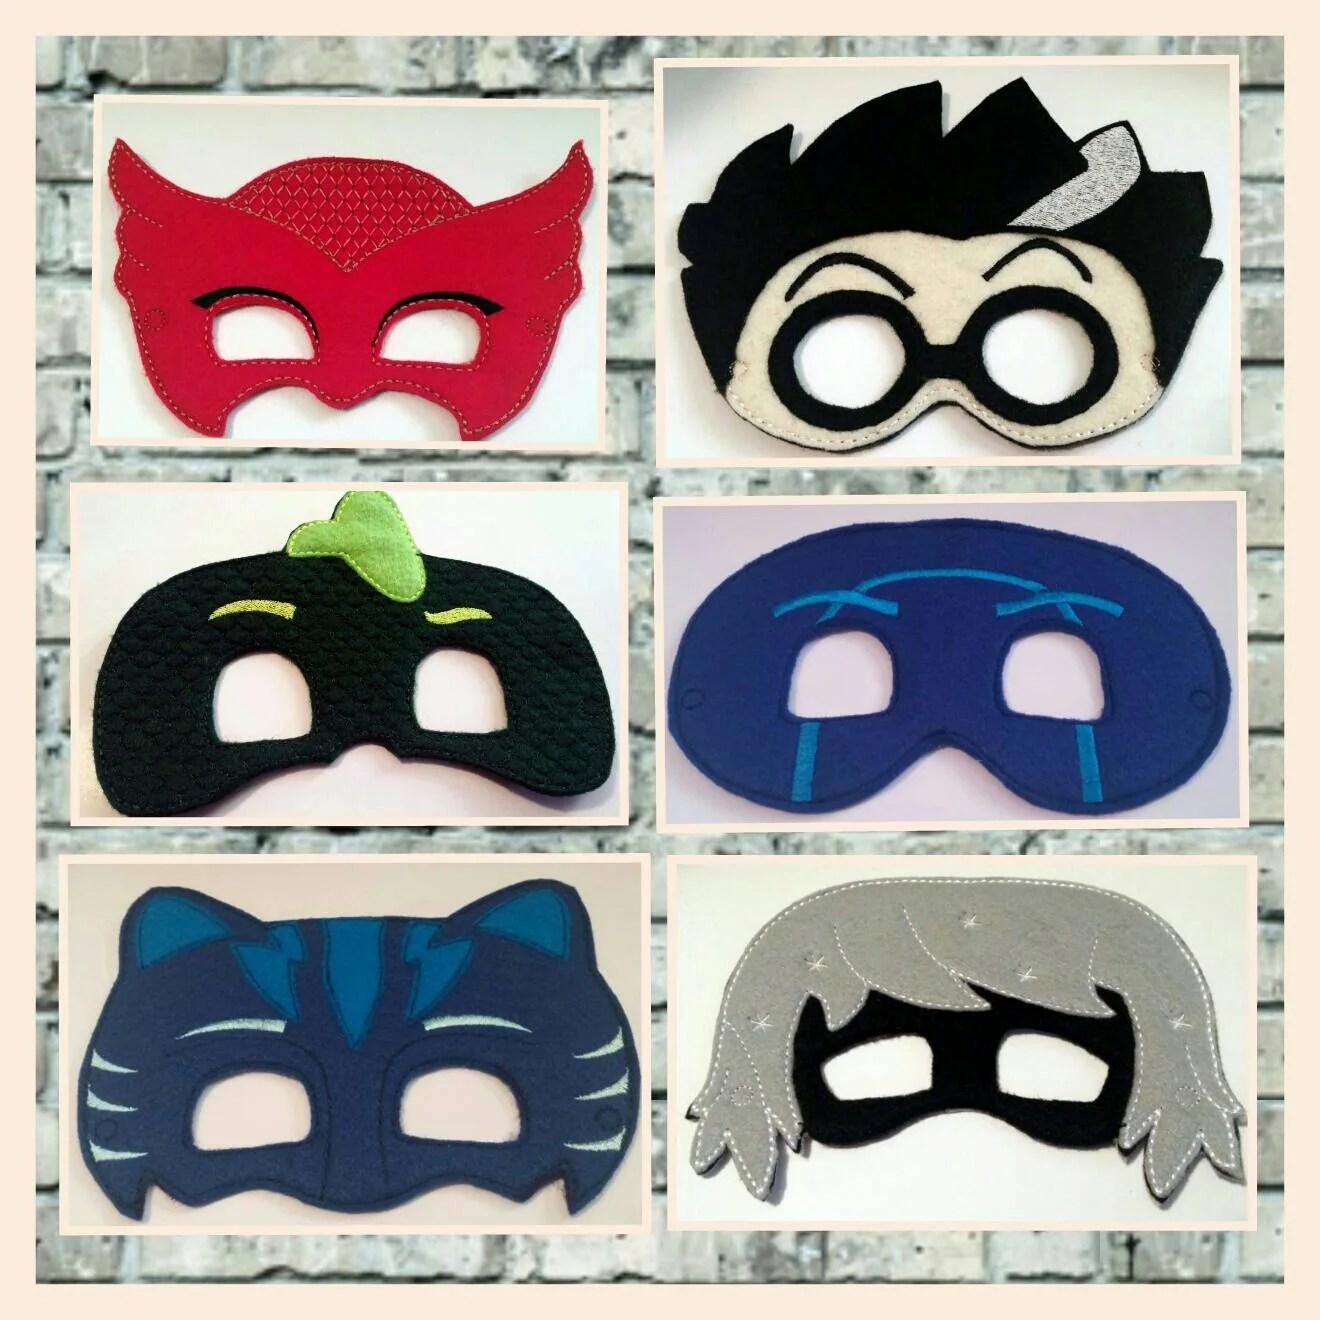 Pj Masks Pretend Play Masks Handmade Mask Dress Up Mask